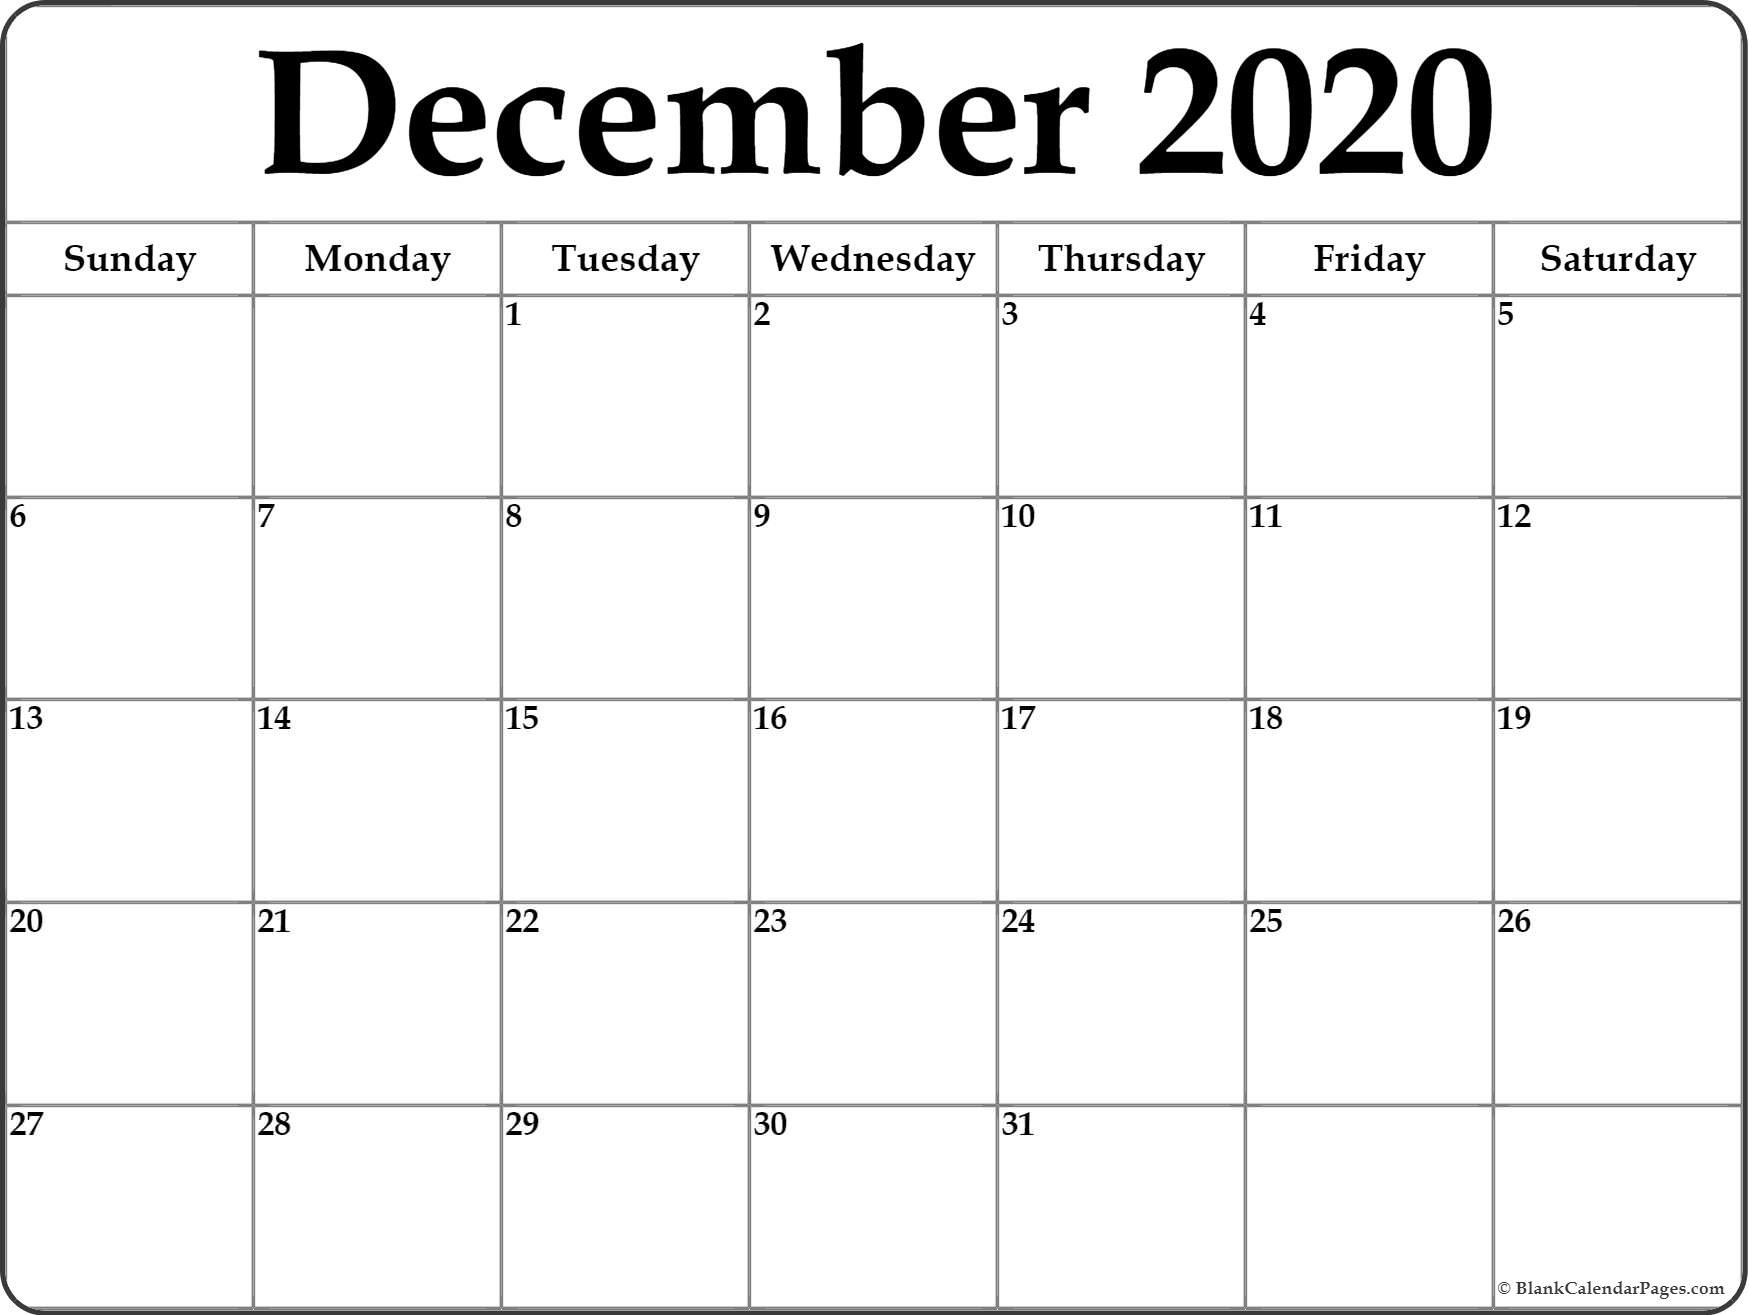 December 2020 Calendar | Free Printable Monthly Calendars-Blank 2020 Calendar Month By Month